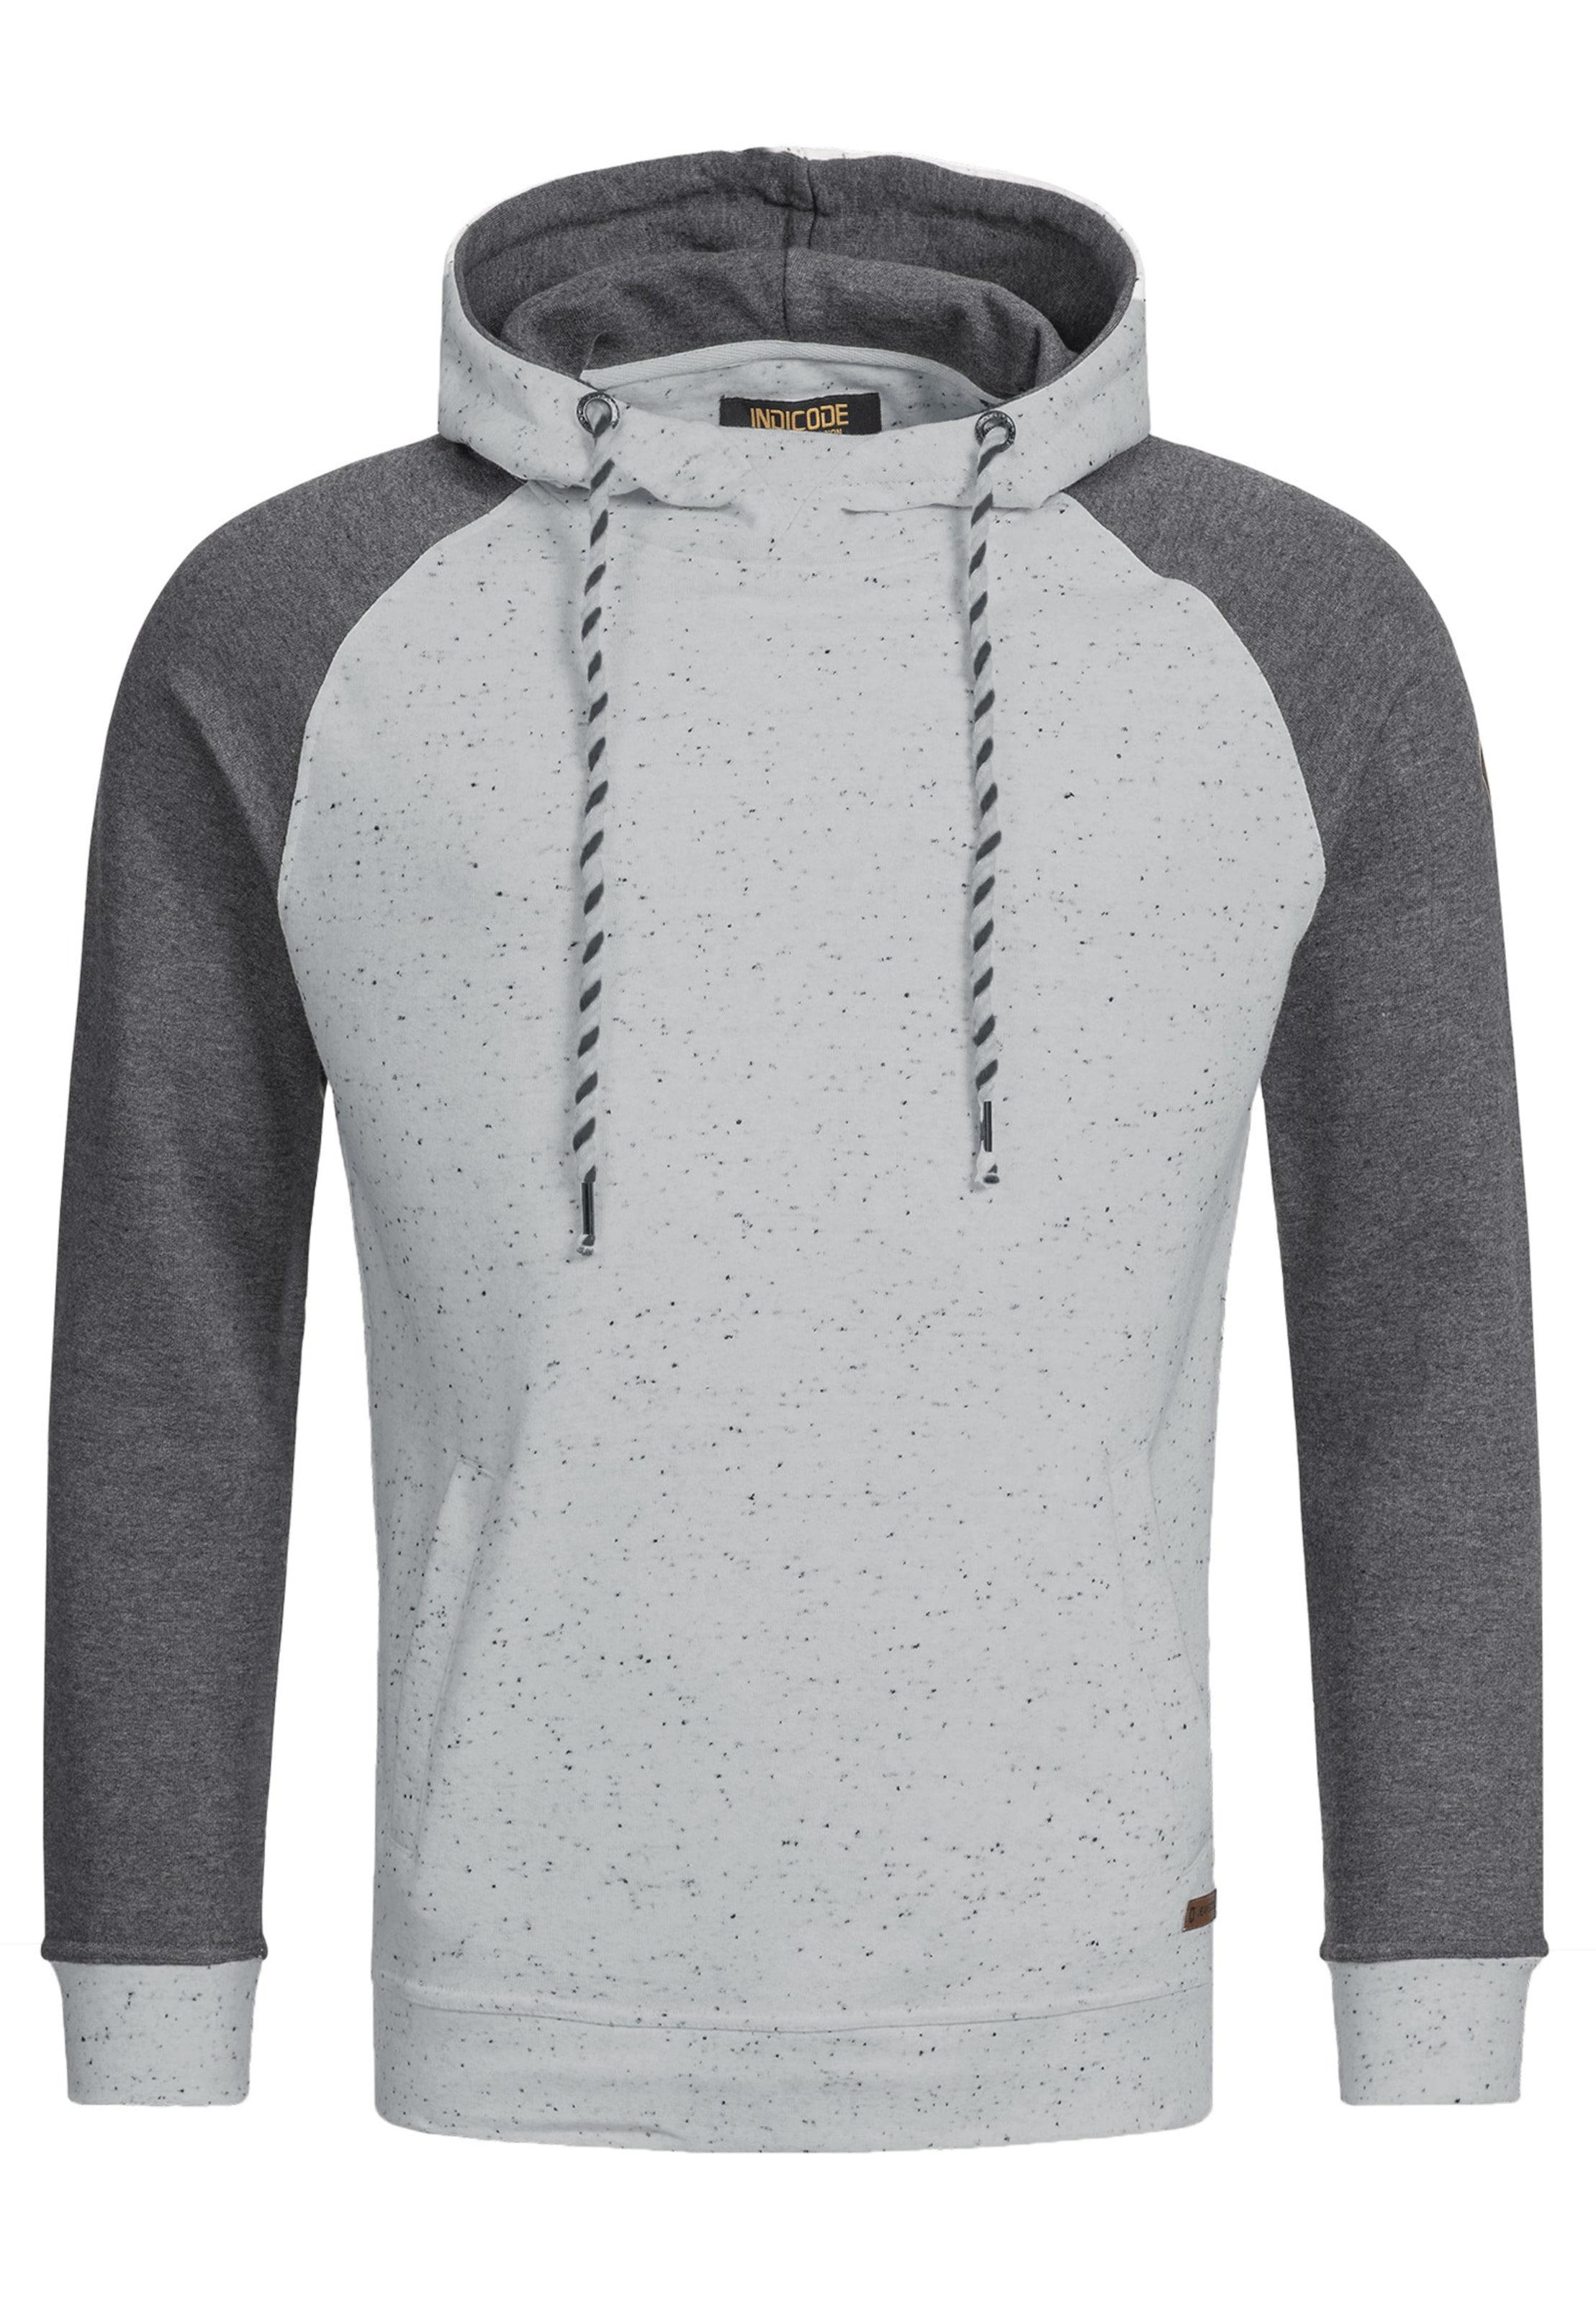 Jeans 'ilyes' HellgrauDunkelgrau Indicode Sweatshirt In 7f6ygYbv